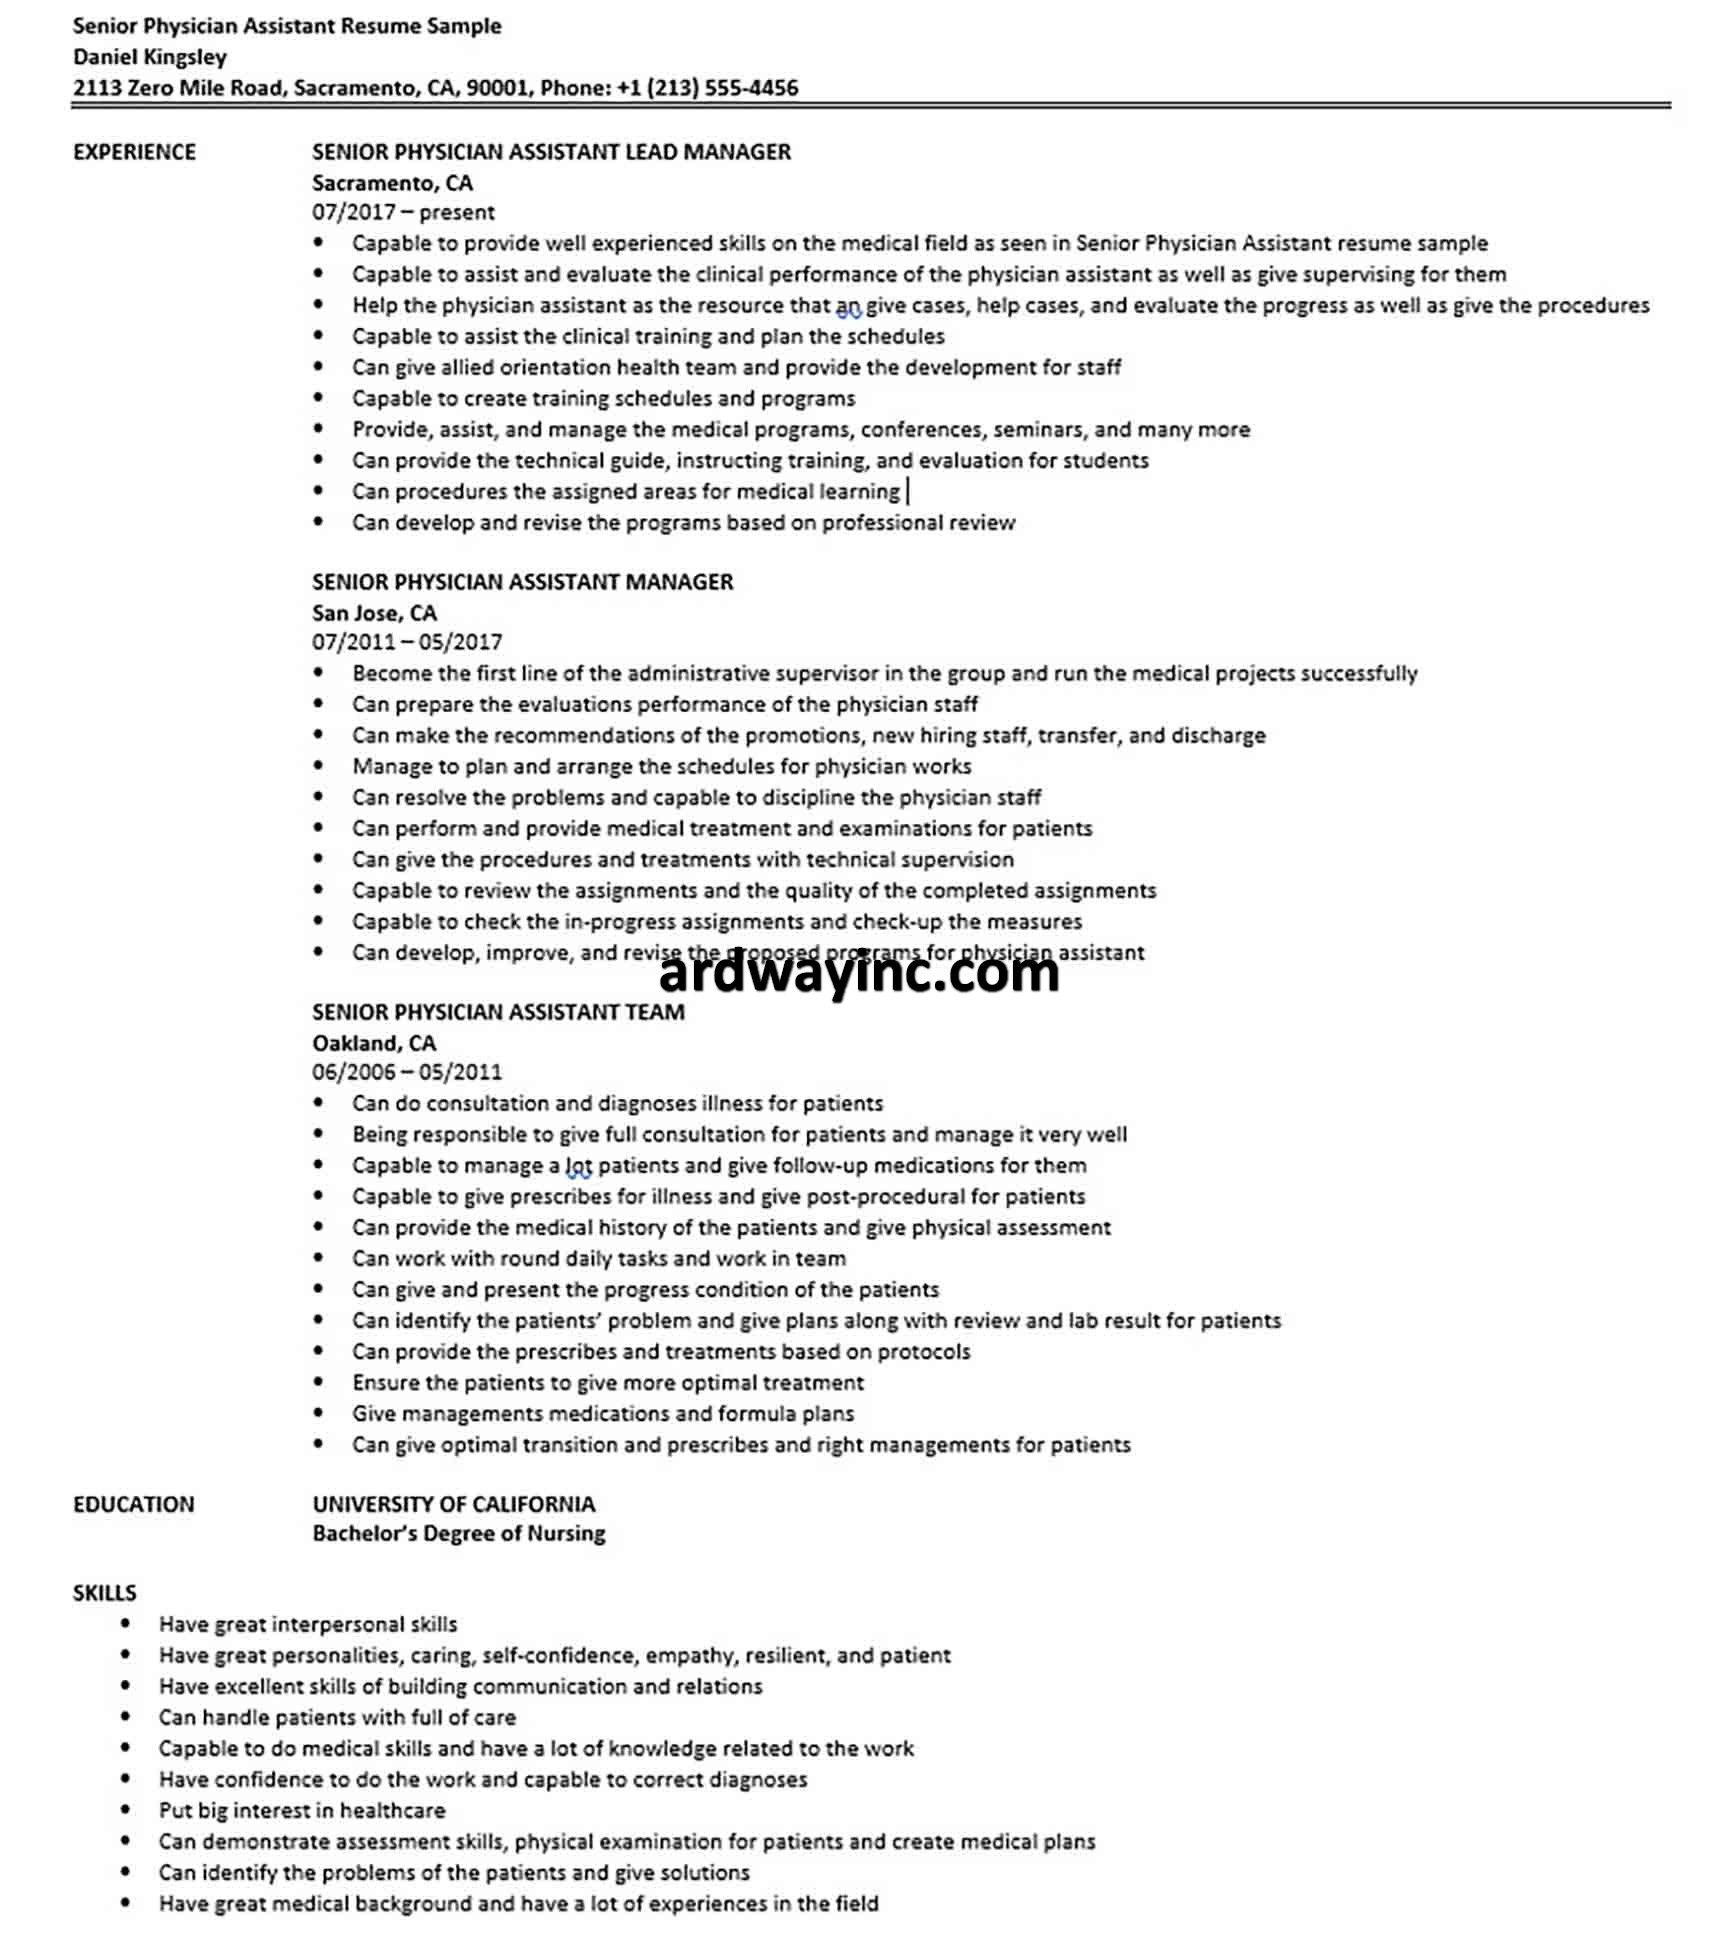 senior physician assistant resume sample high school job examples esl teacher cv example for download